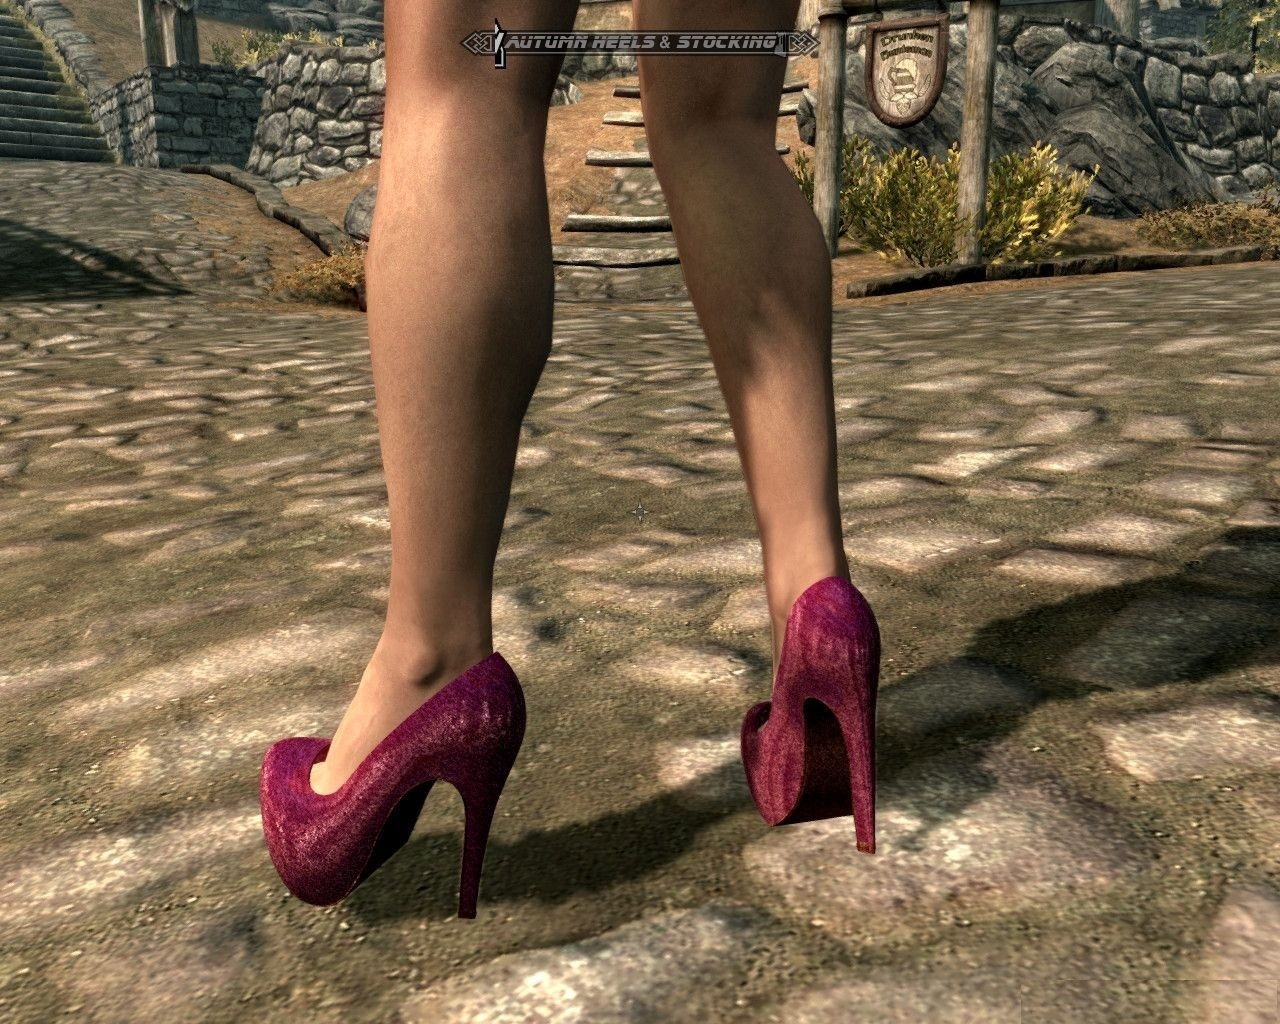 Autumn_heels_and_stockings.jpg